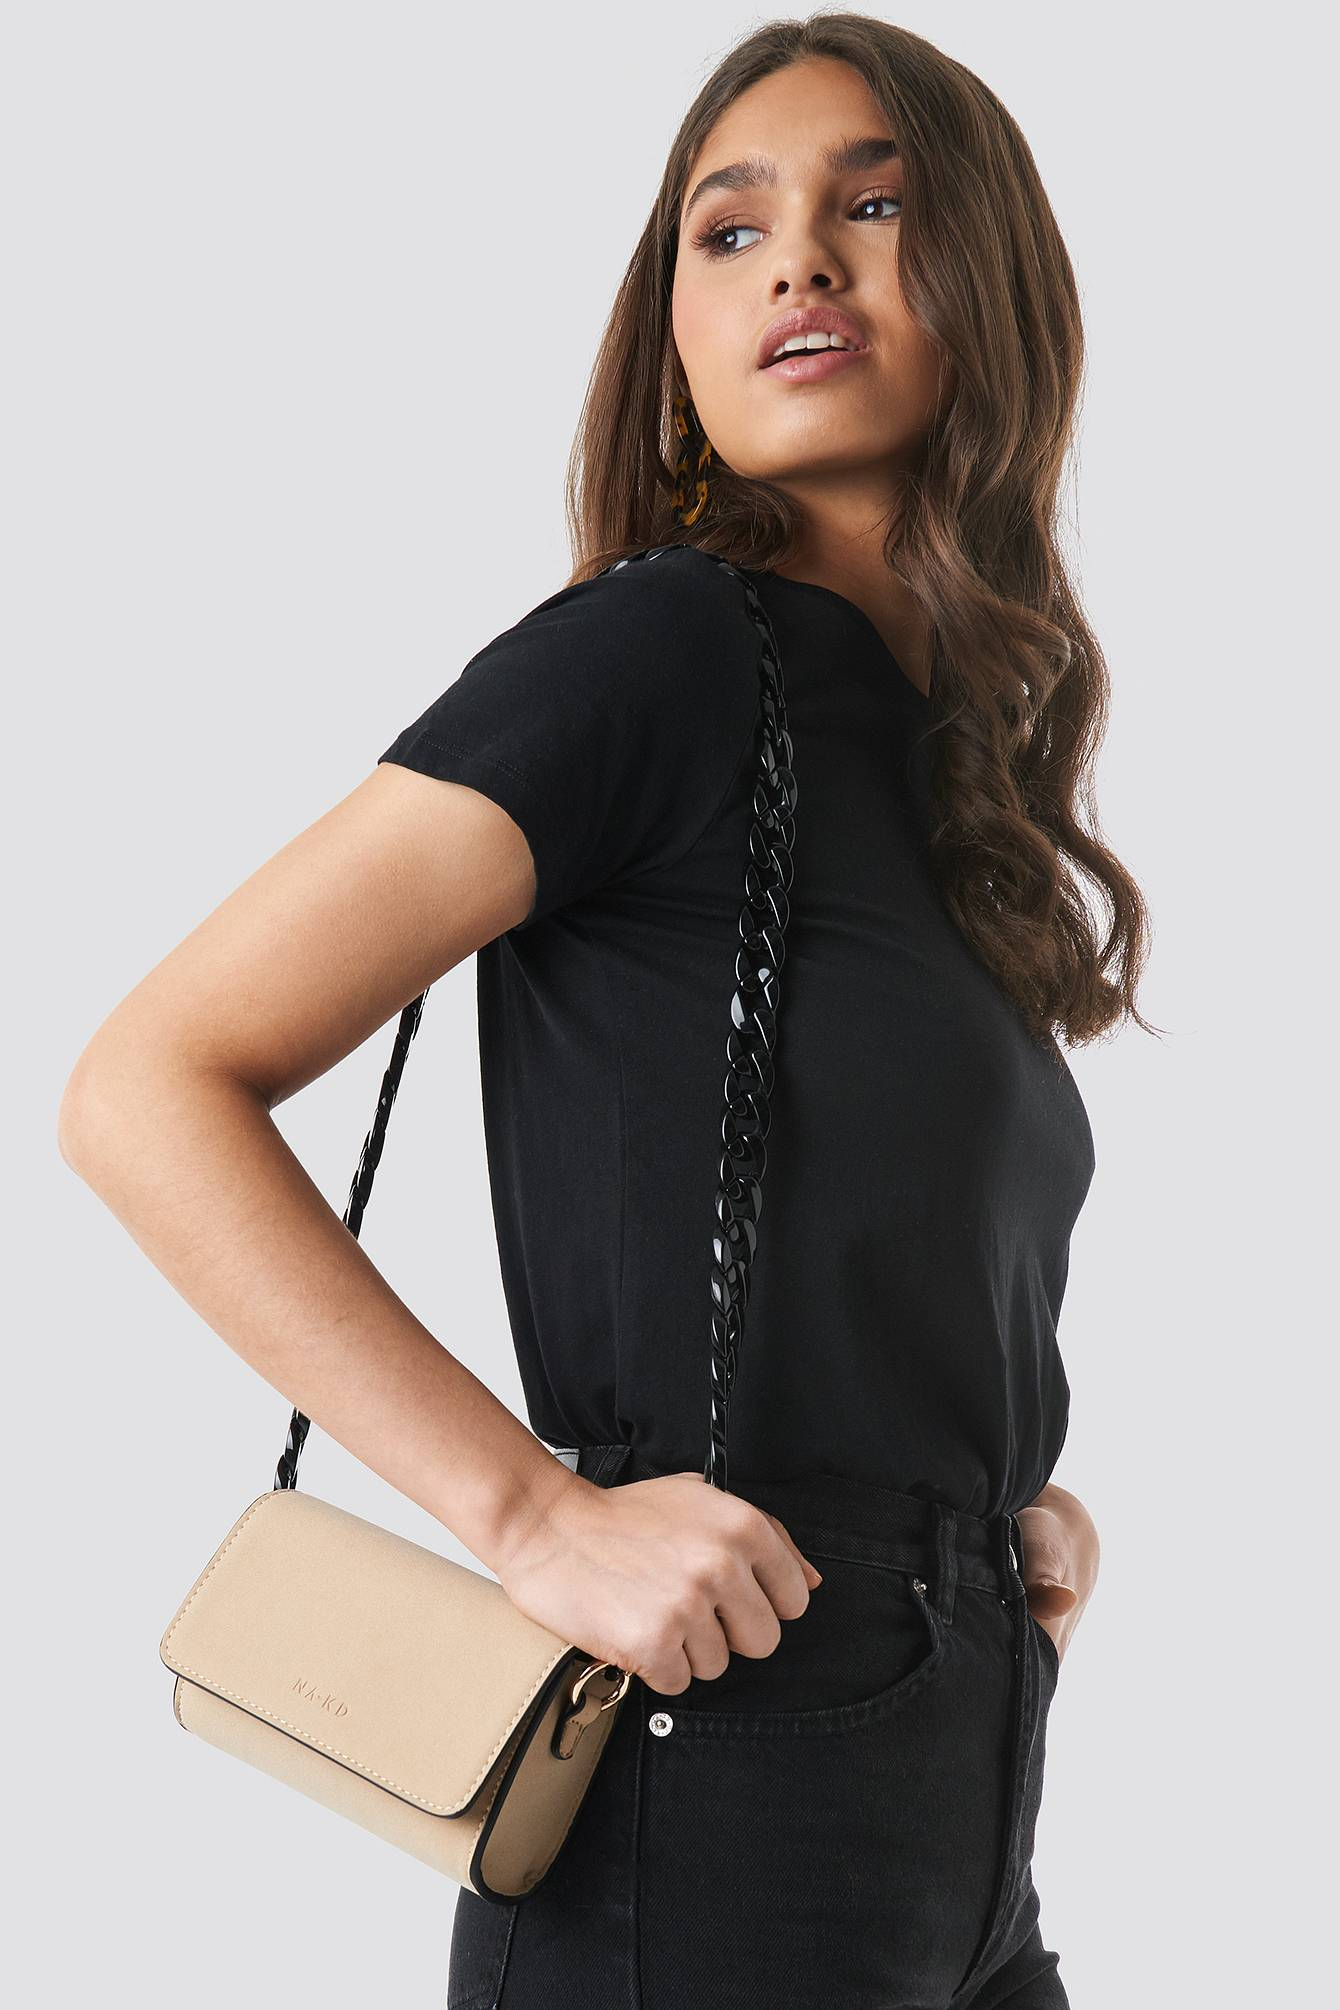 NA-KD Accessories Pop Chain Cross Body Bag - Beige